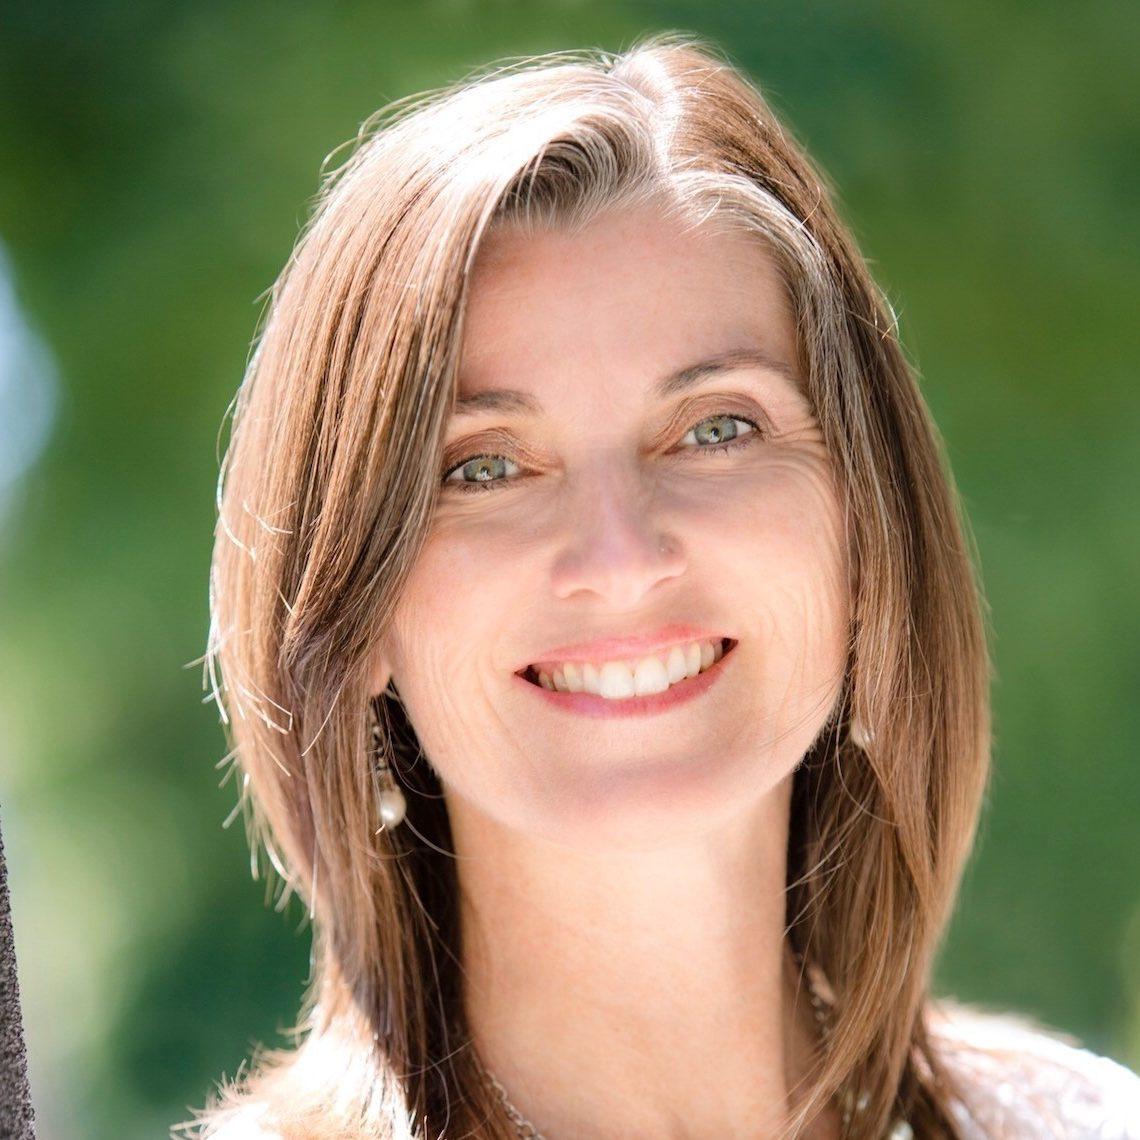 Joanne Mulhall